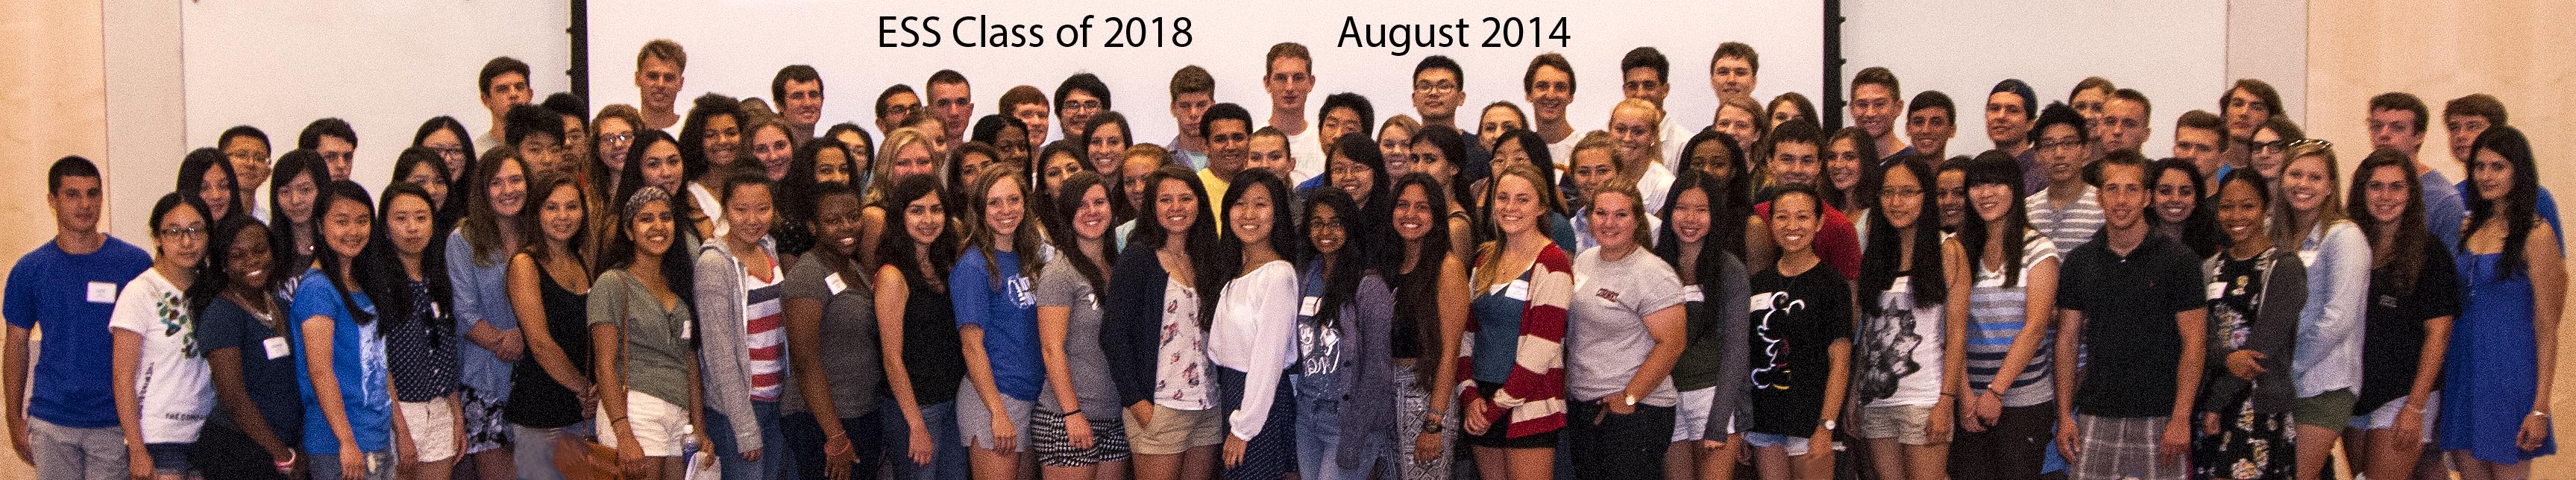 ESS Class of 2018